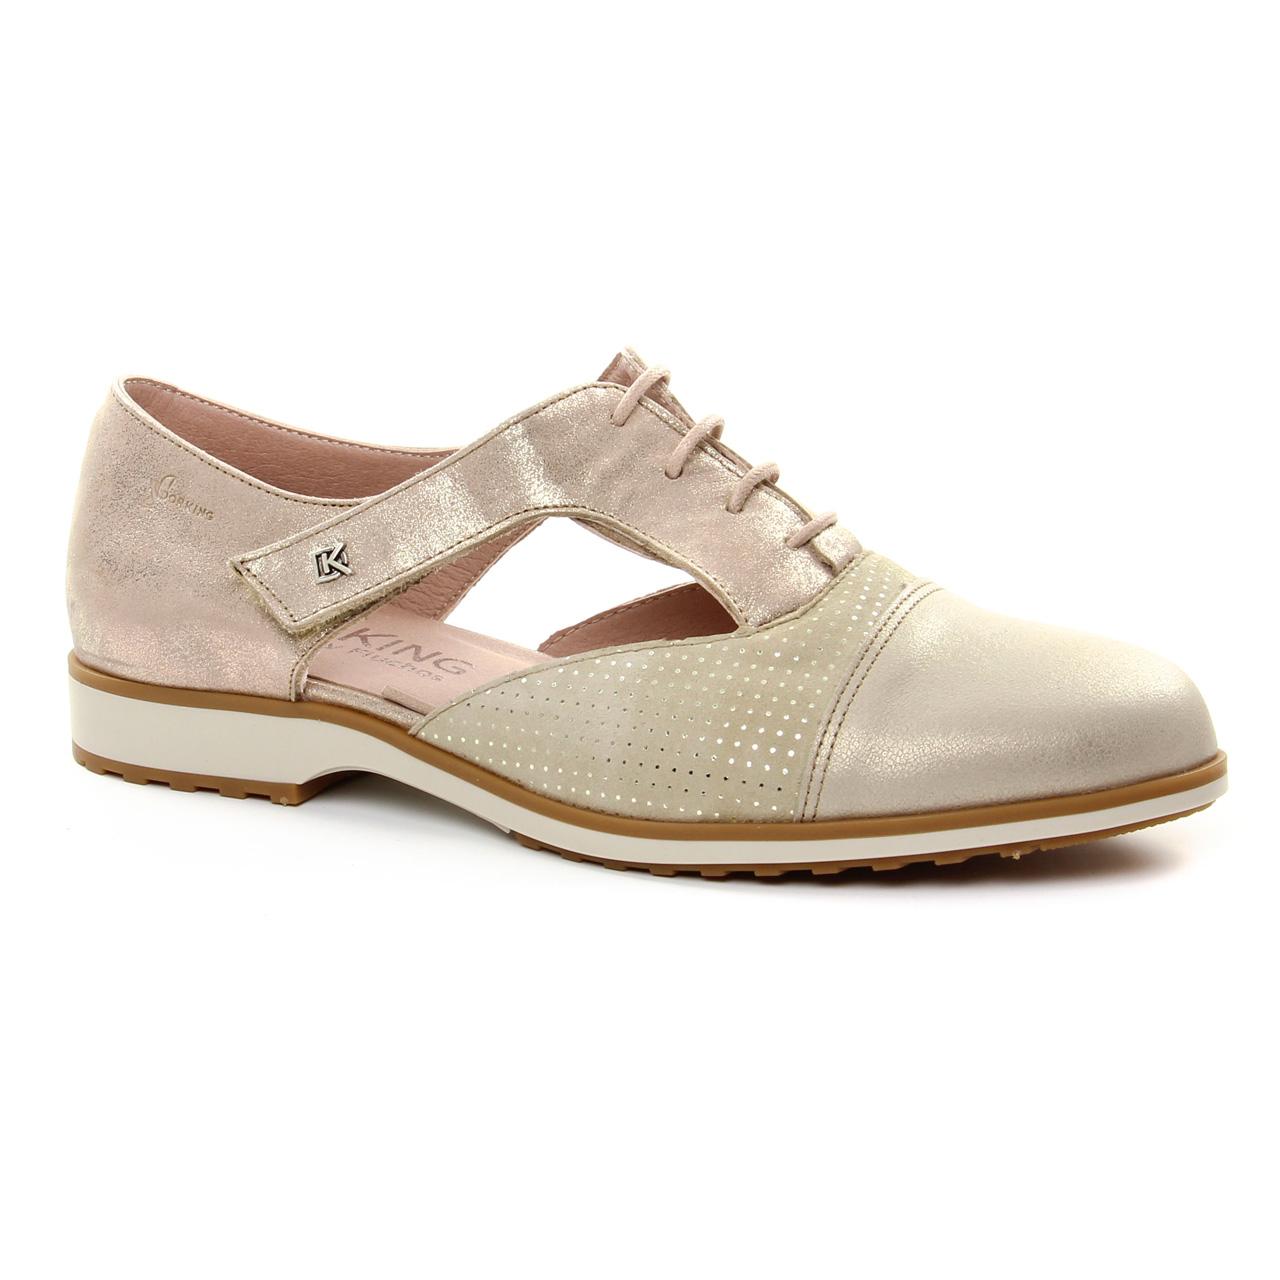 Dorking Chaussures LOU Acheter Pas Cher Populaire XKjvtkOntI